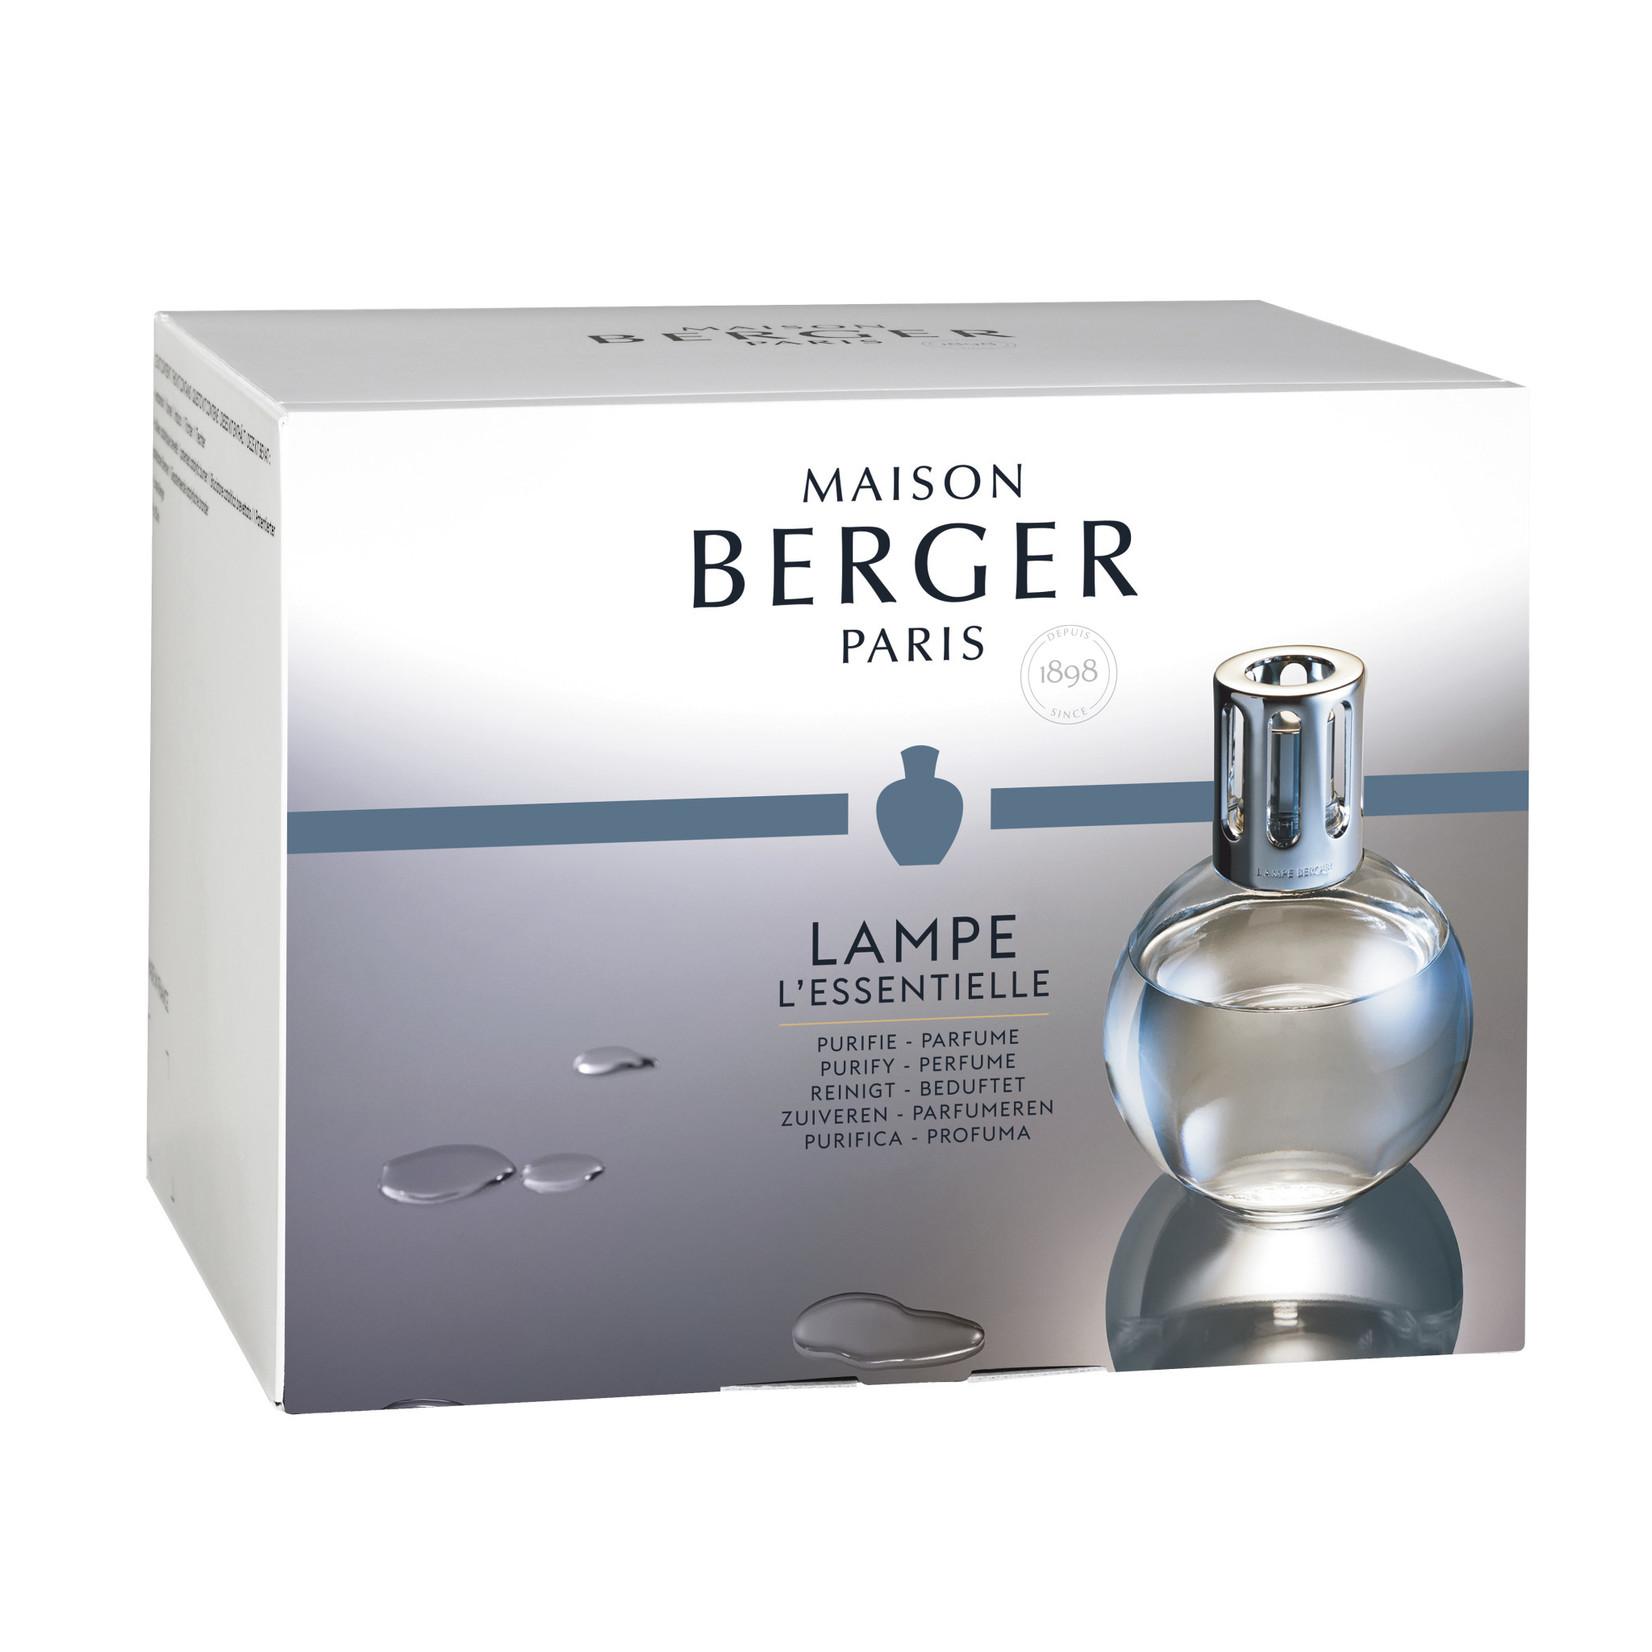 Lampe Berger Lampe Berger Huisparfum Startersset Ronde fles met 2 geur flesjes 250 ml